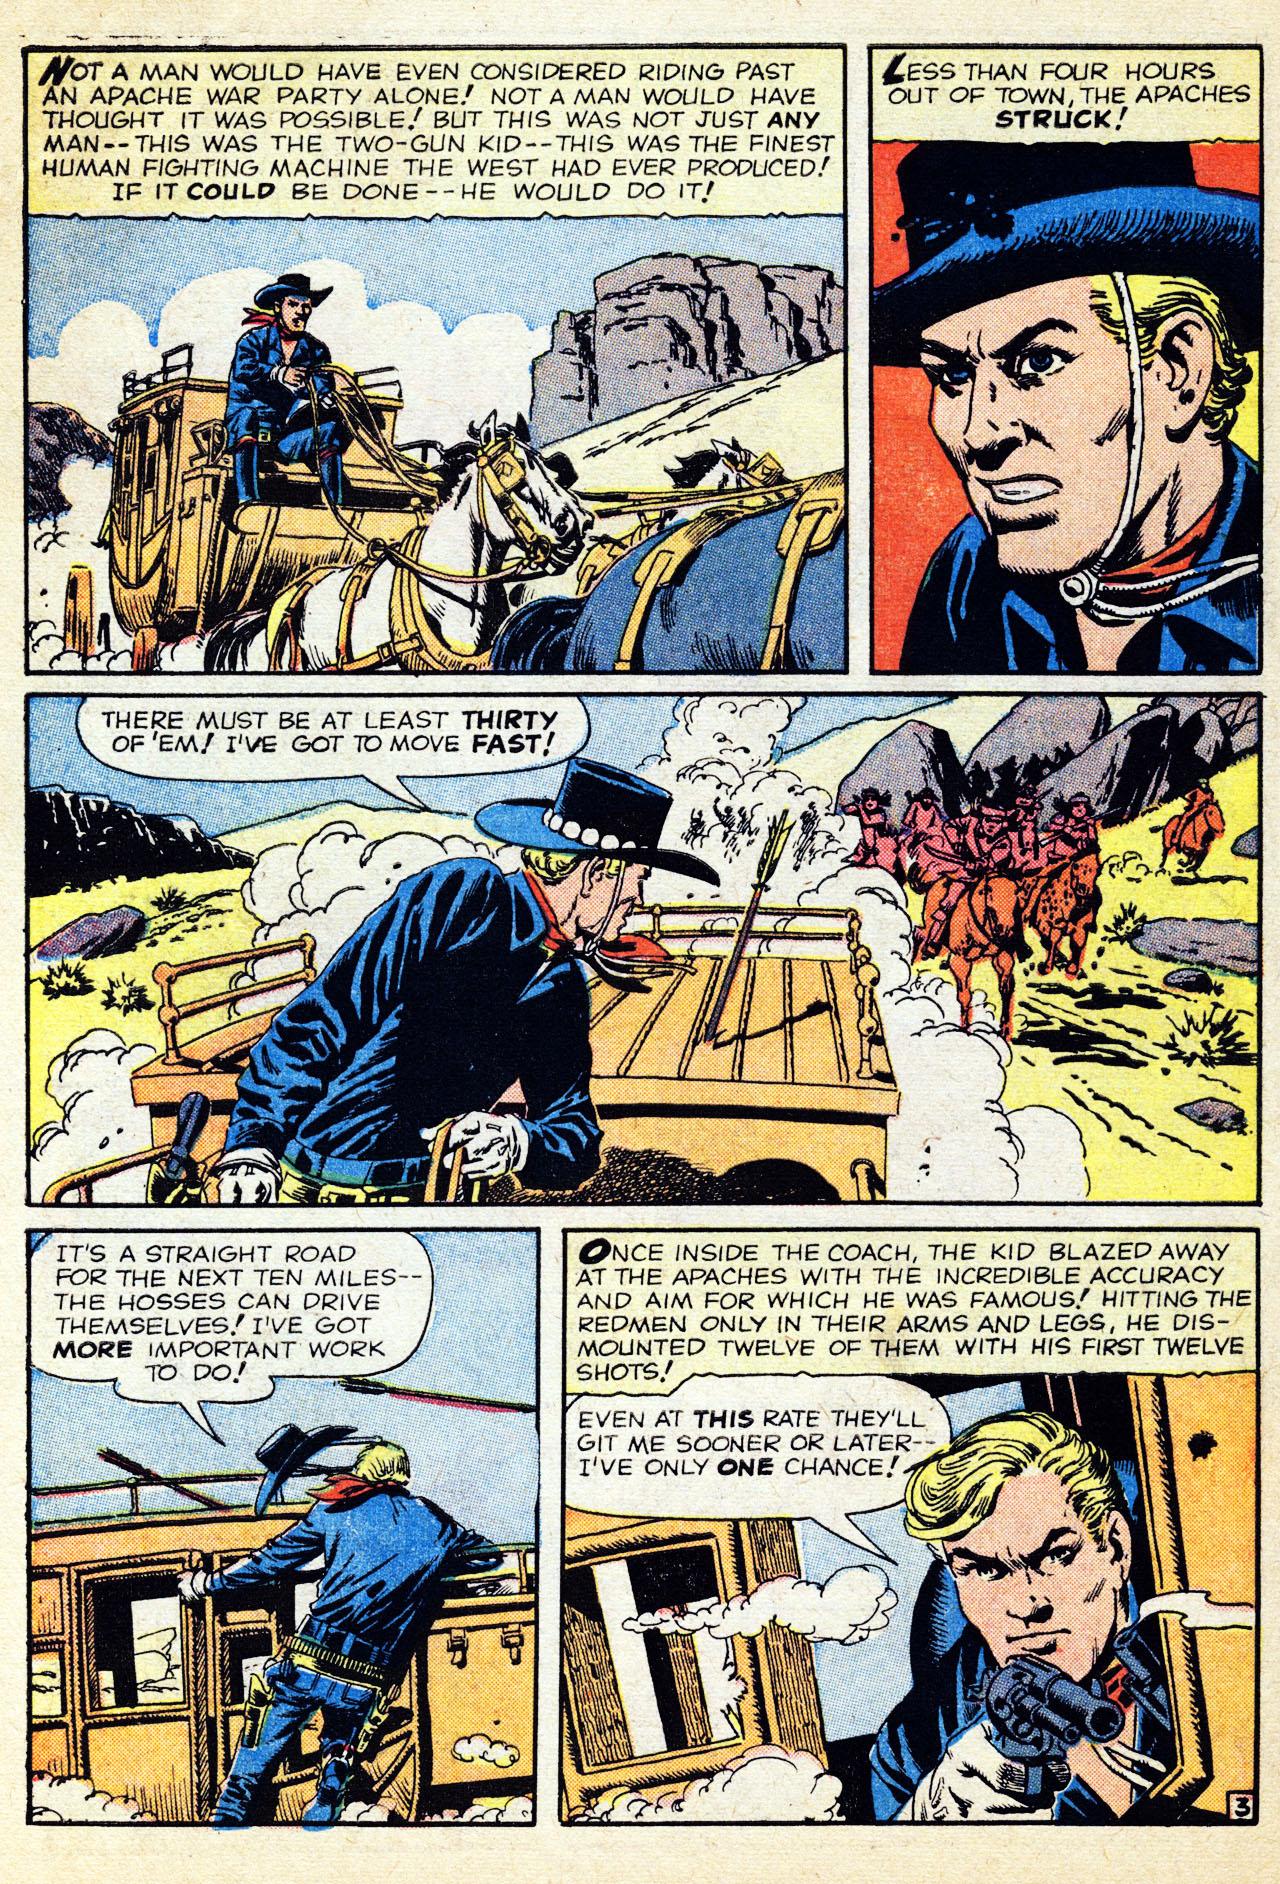 Read online Two-Gun Kid comic -  Issue #52 - 30